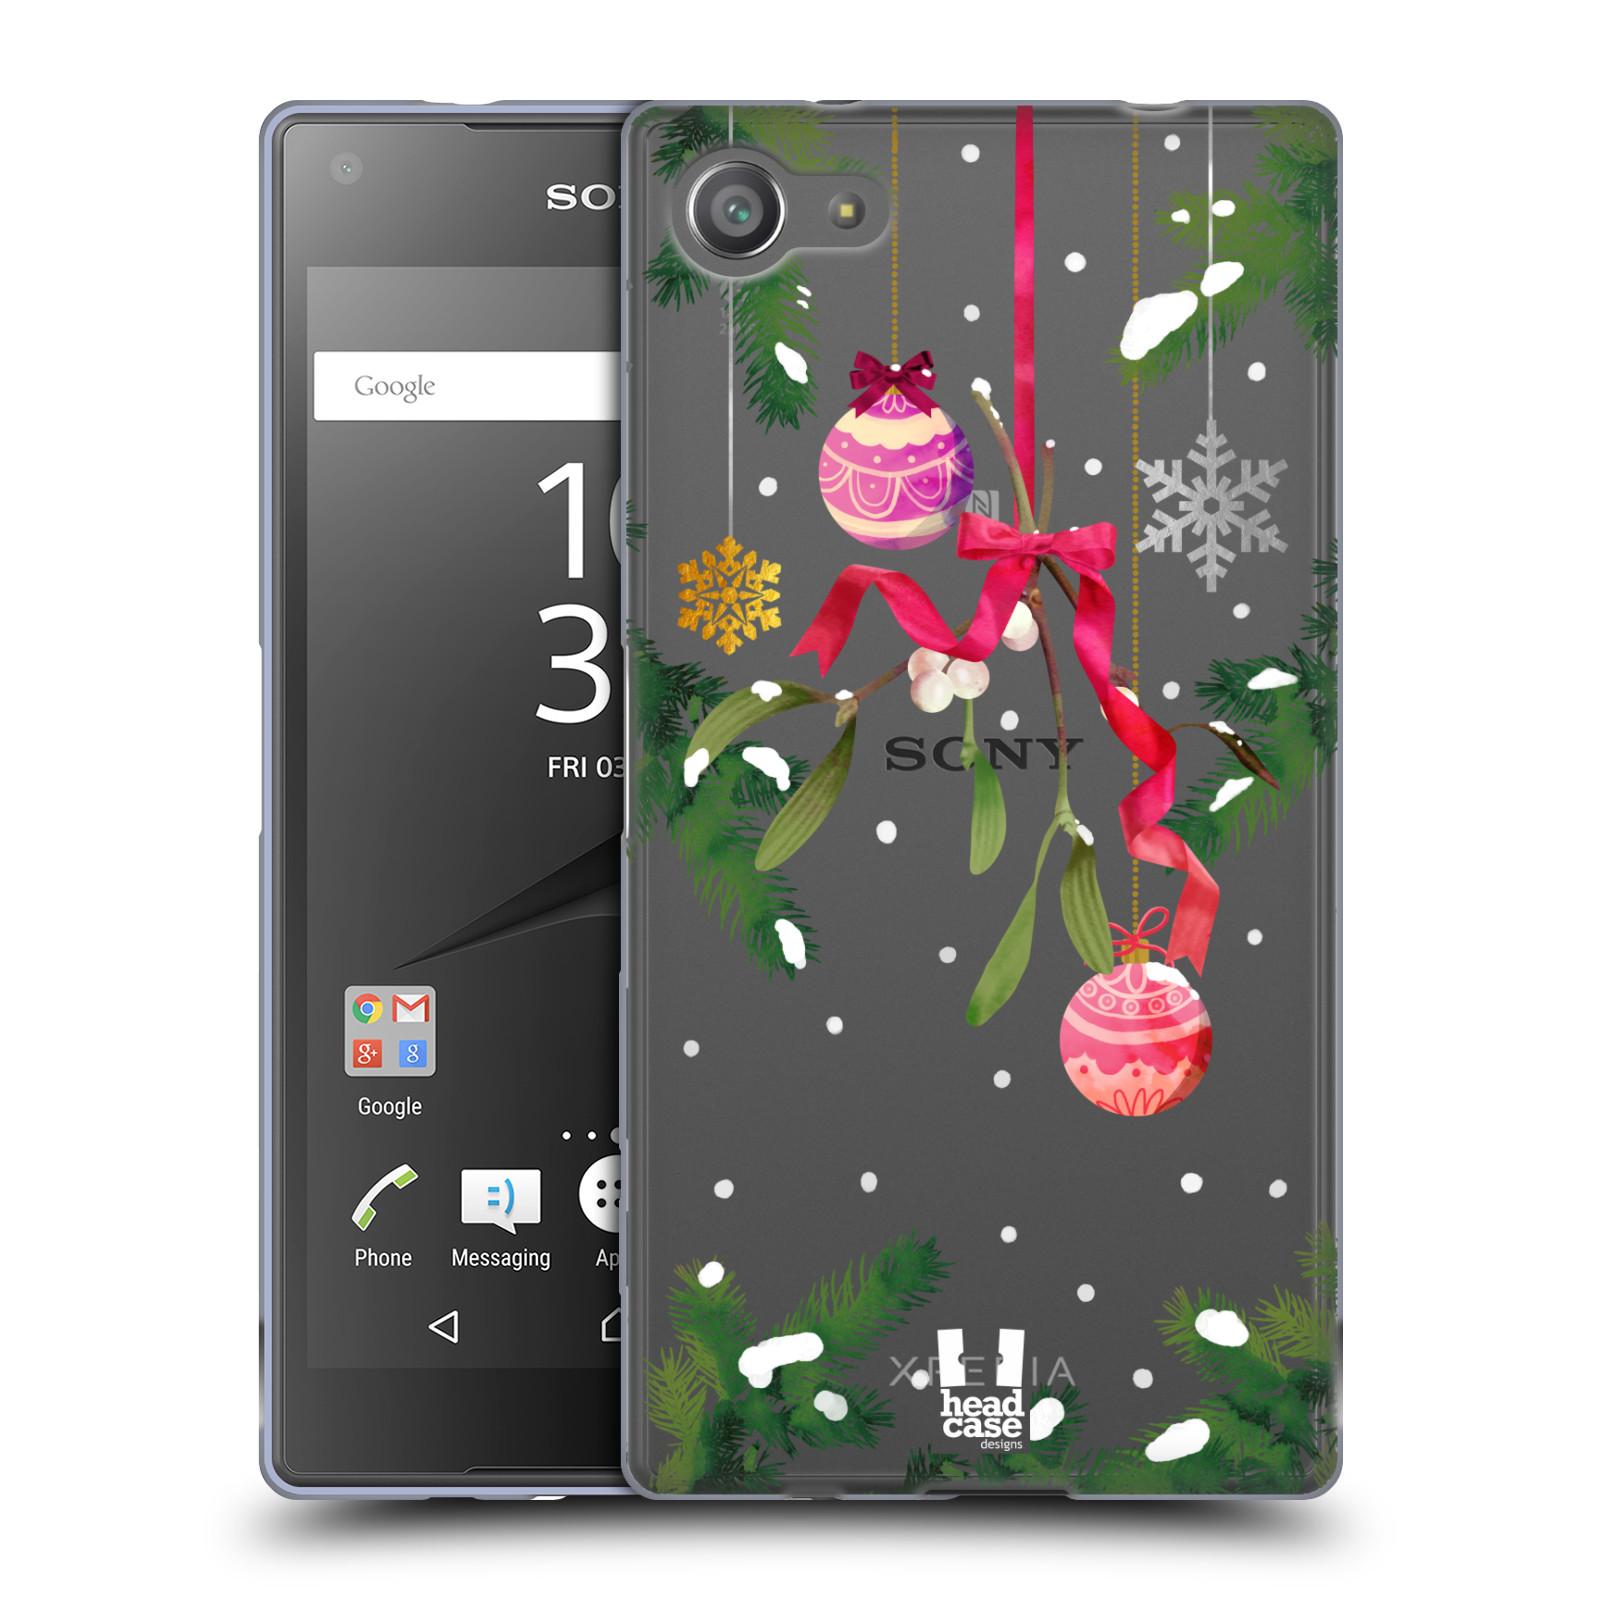 Silikonové pouzdro na mobil Sony Xperia Z5 Compact - Head Case - Větvičky a vánoční ozdoby